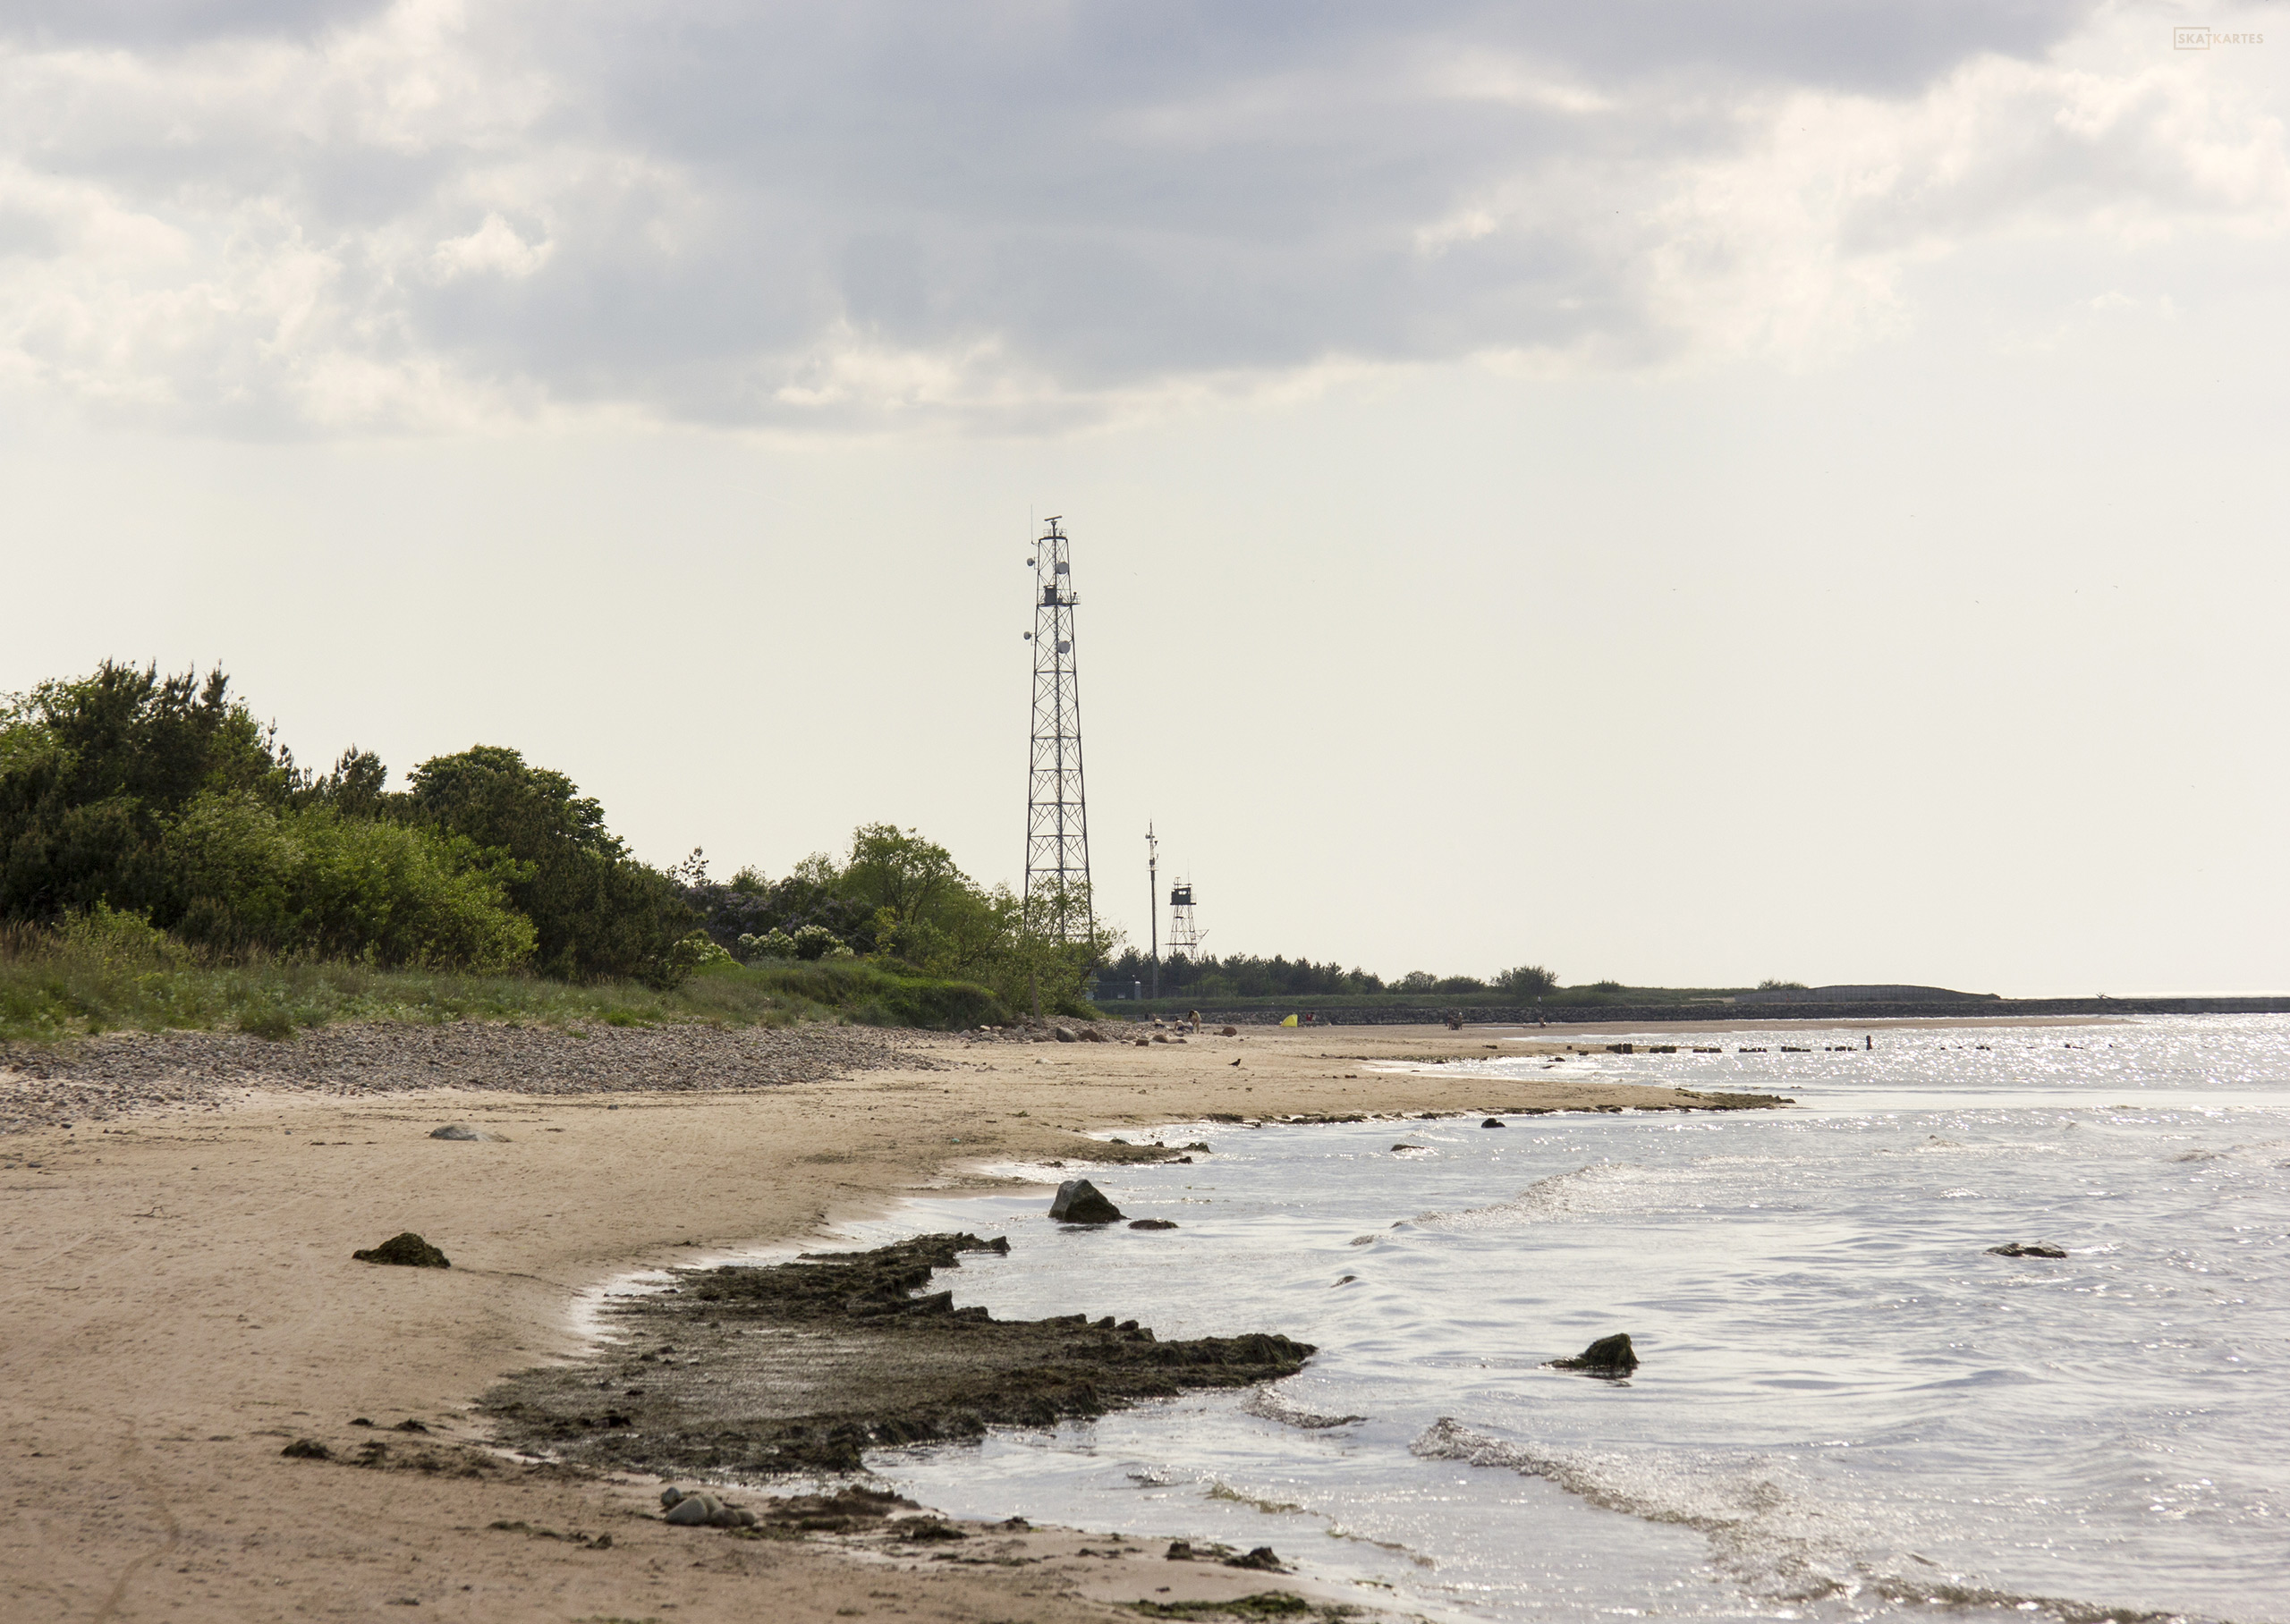 Skatkarte Nr. 1188 - Pāvilostas pludmale, GPS: 56.891833, 21.177382 (2016. gada maijs).